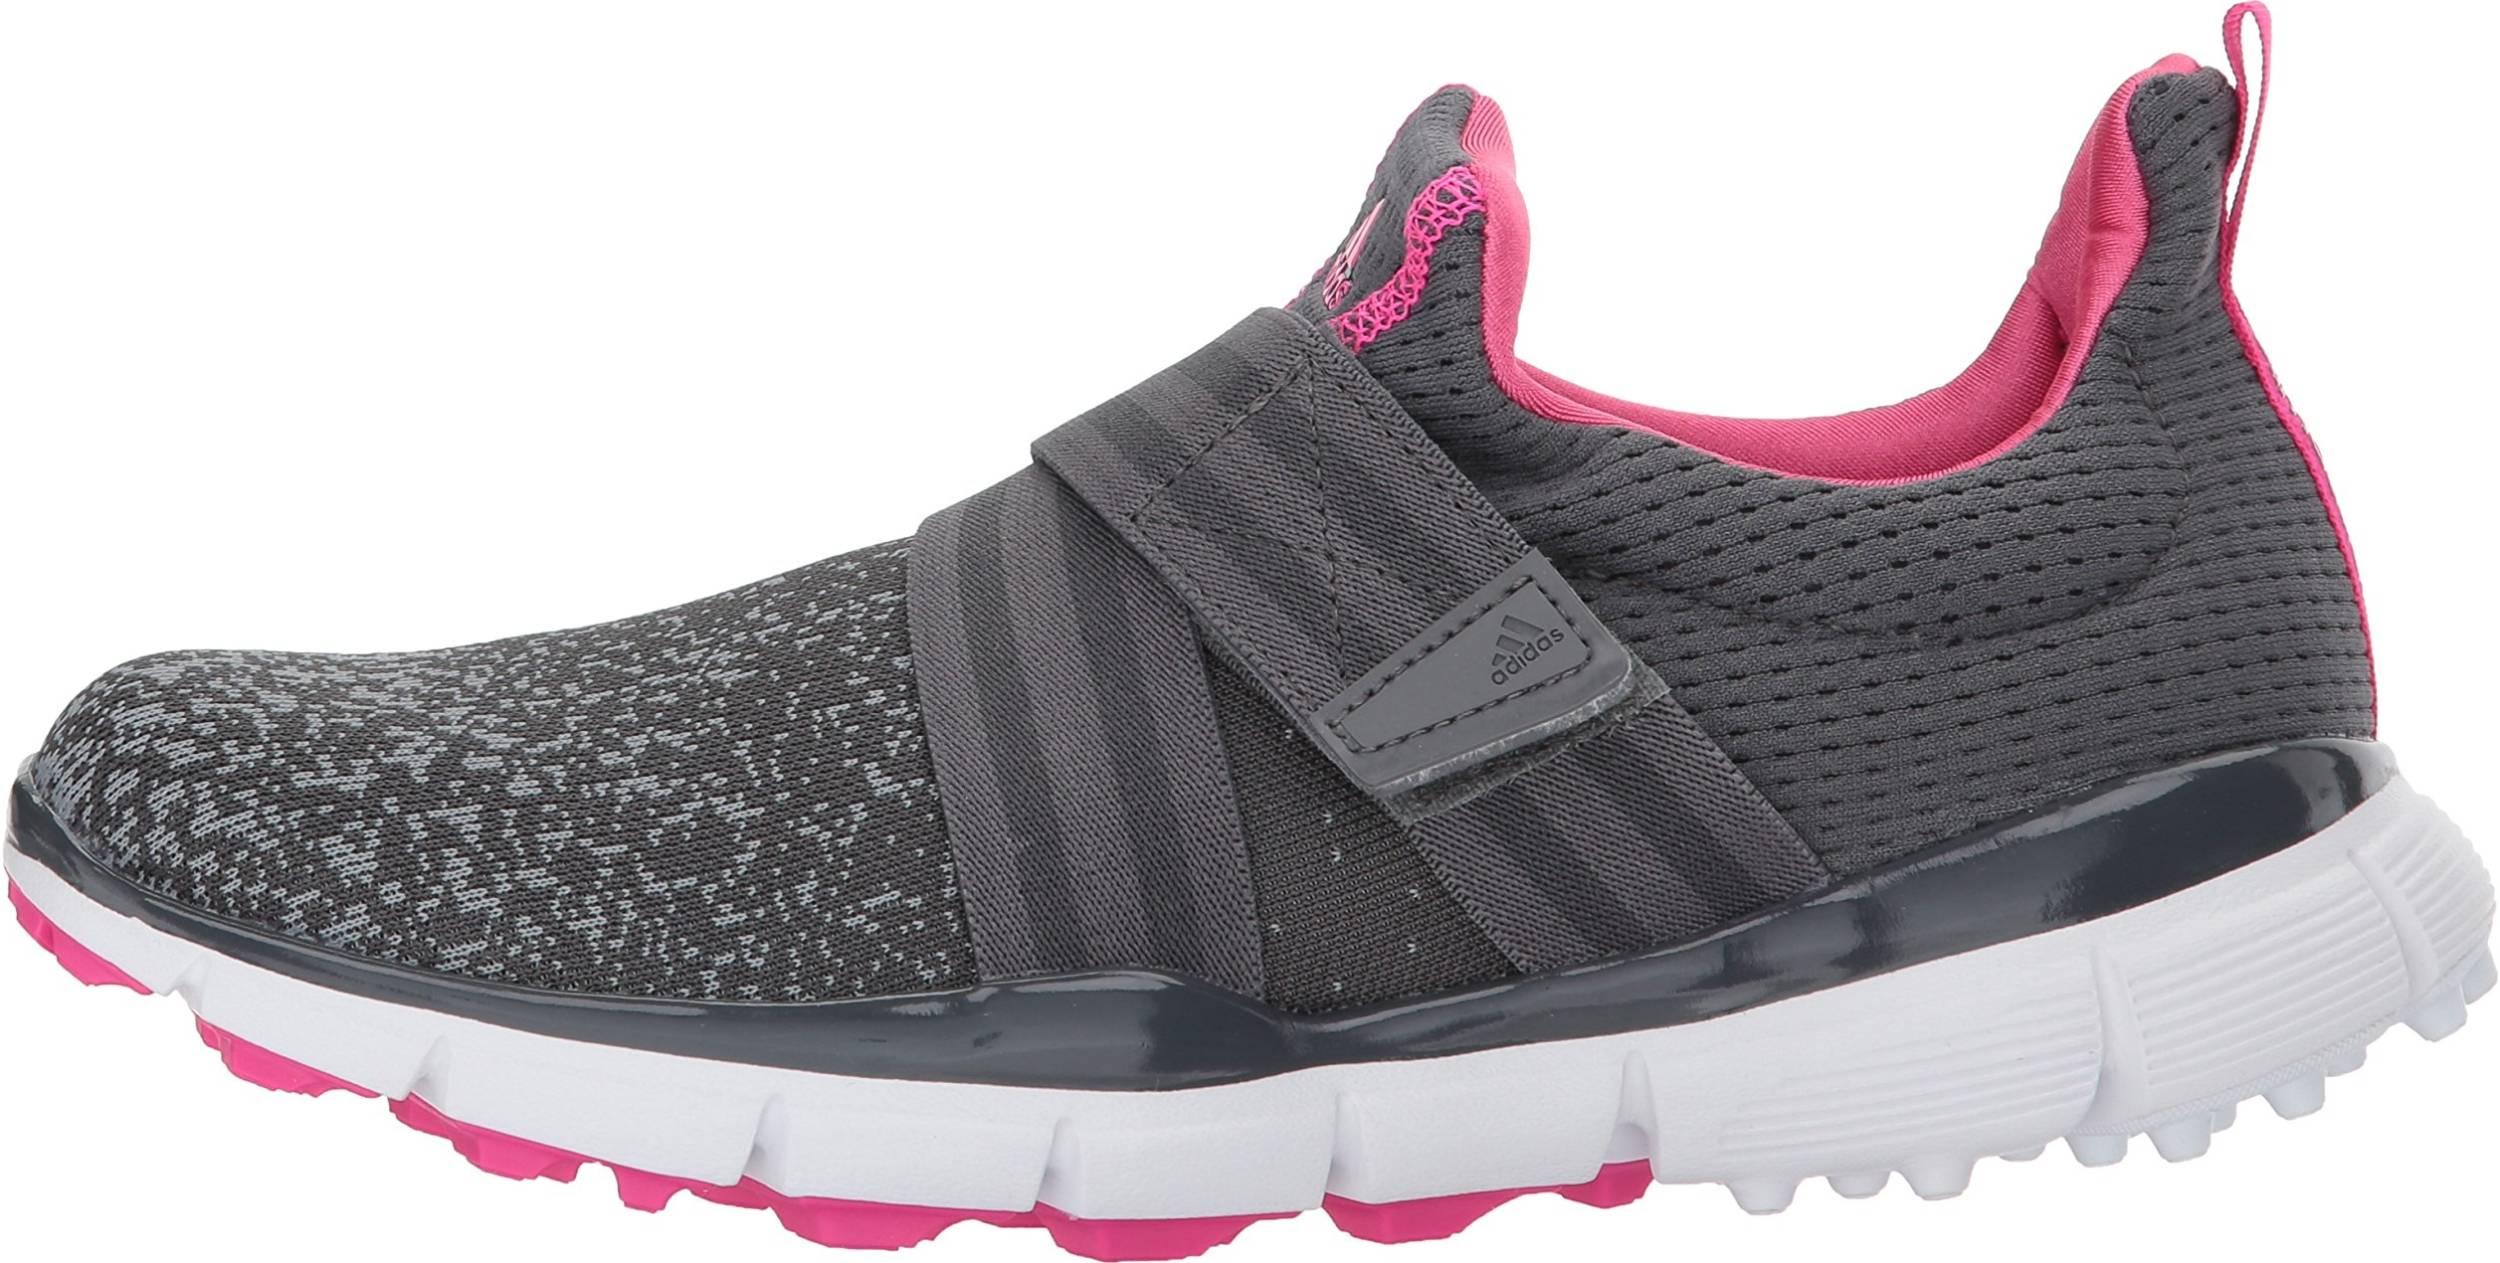 Adidas Climacool Knit